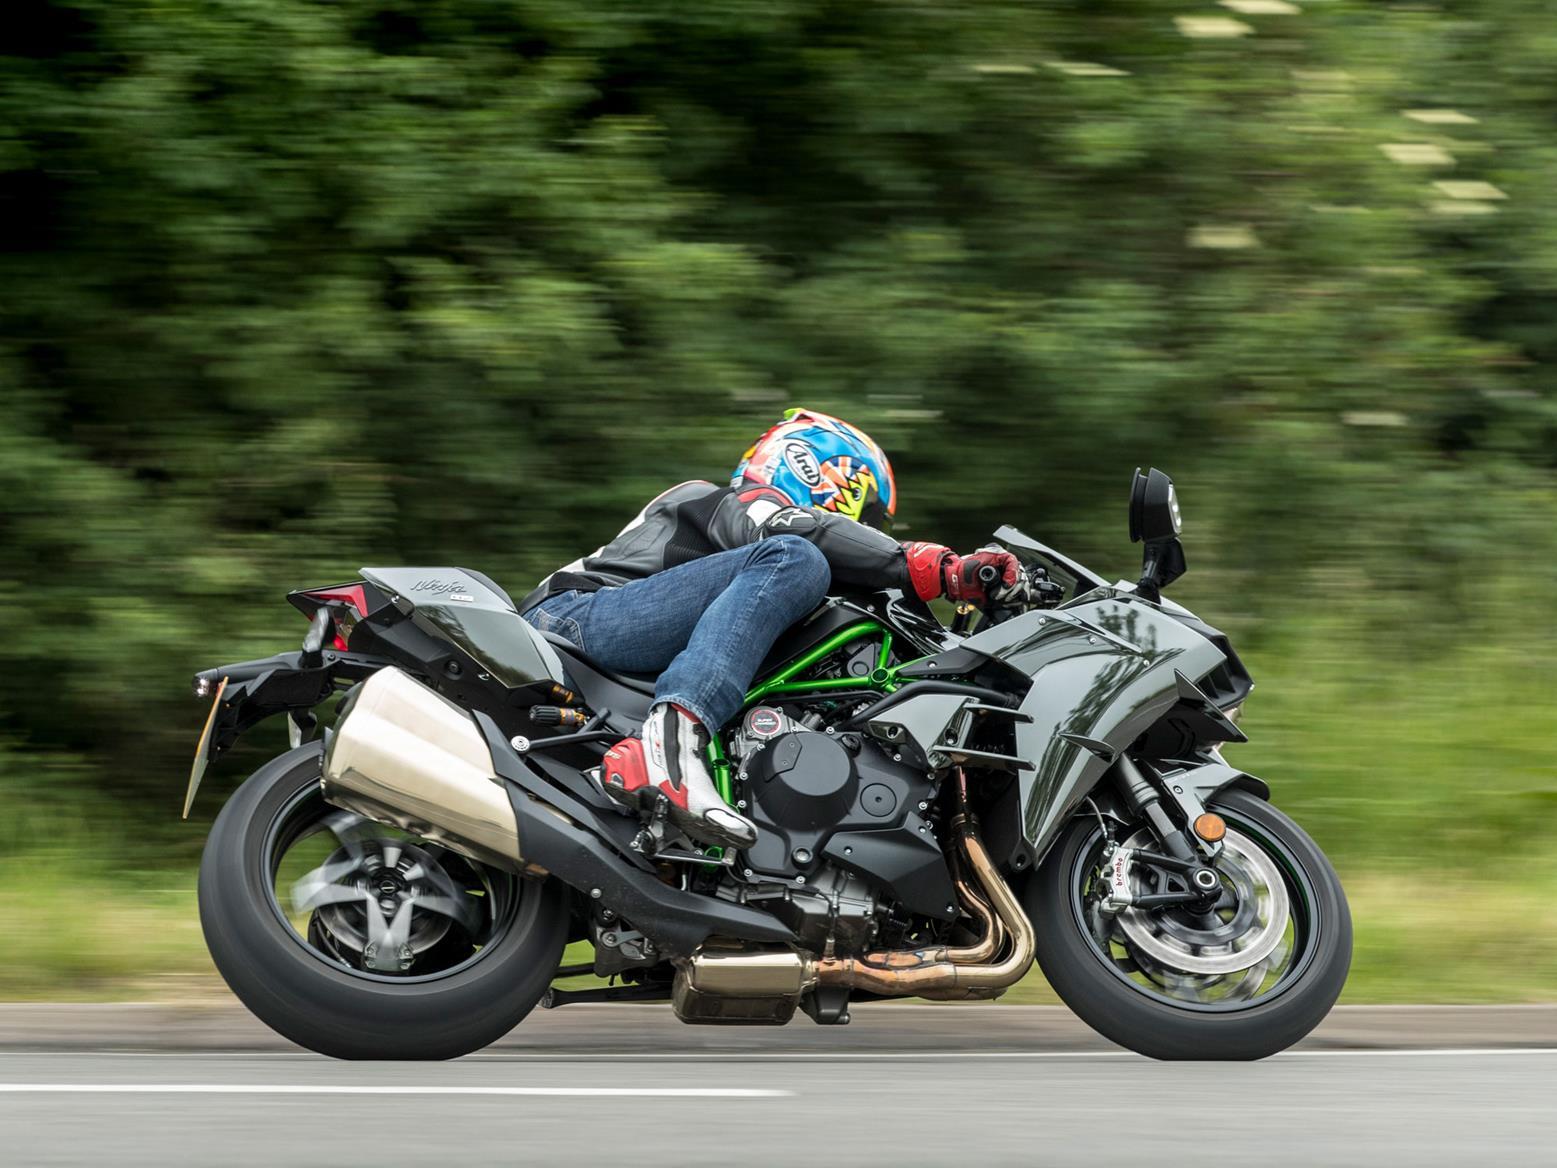 2015 kawasaki ninja 650 review